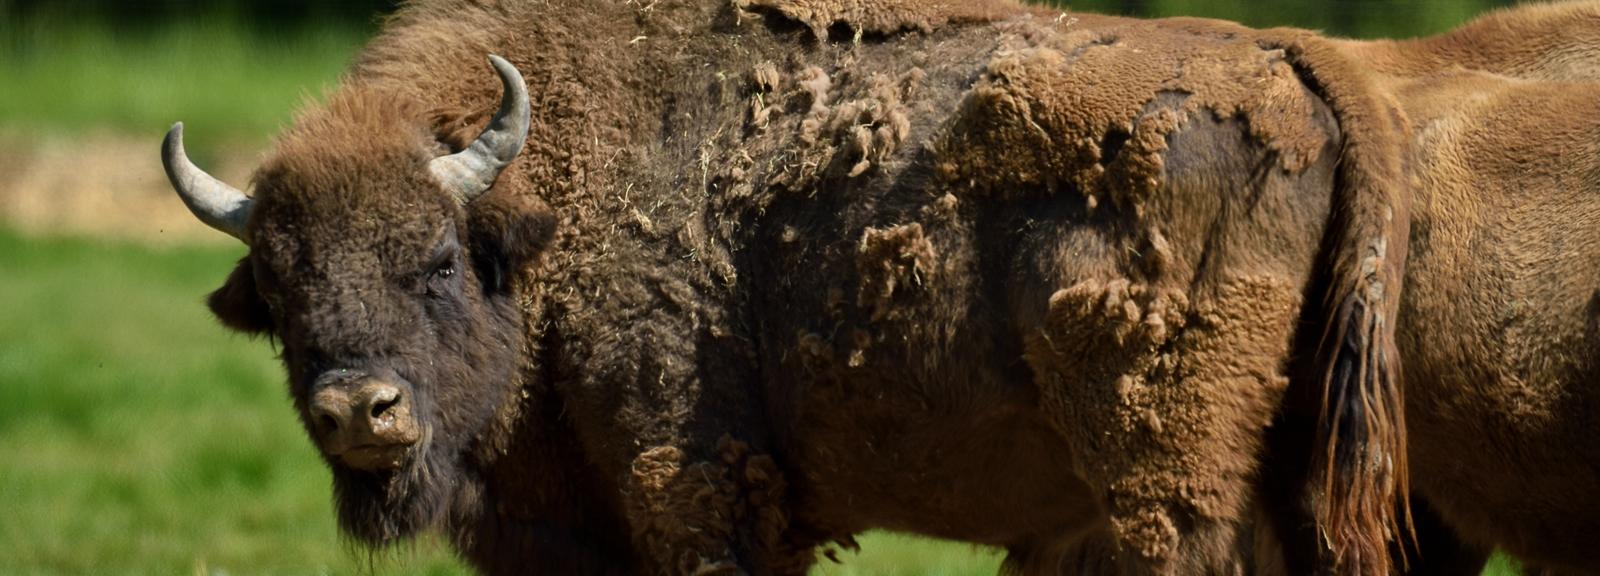 Bisons d'Europe © MNHN - F-G Grandin